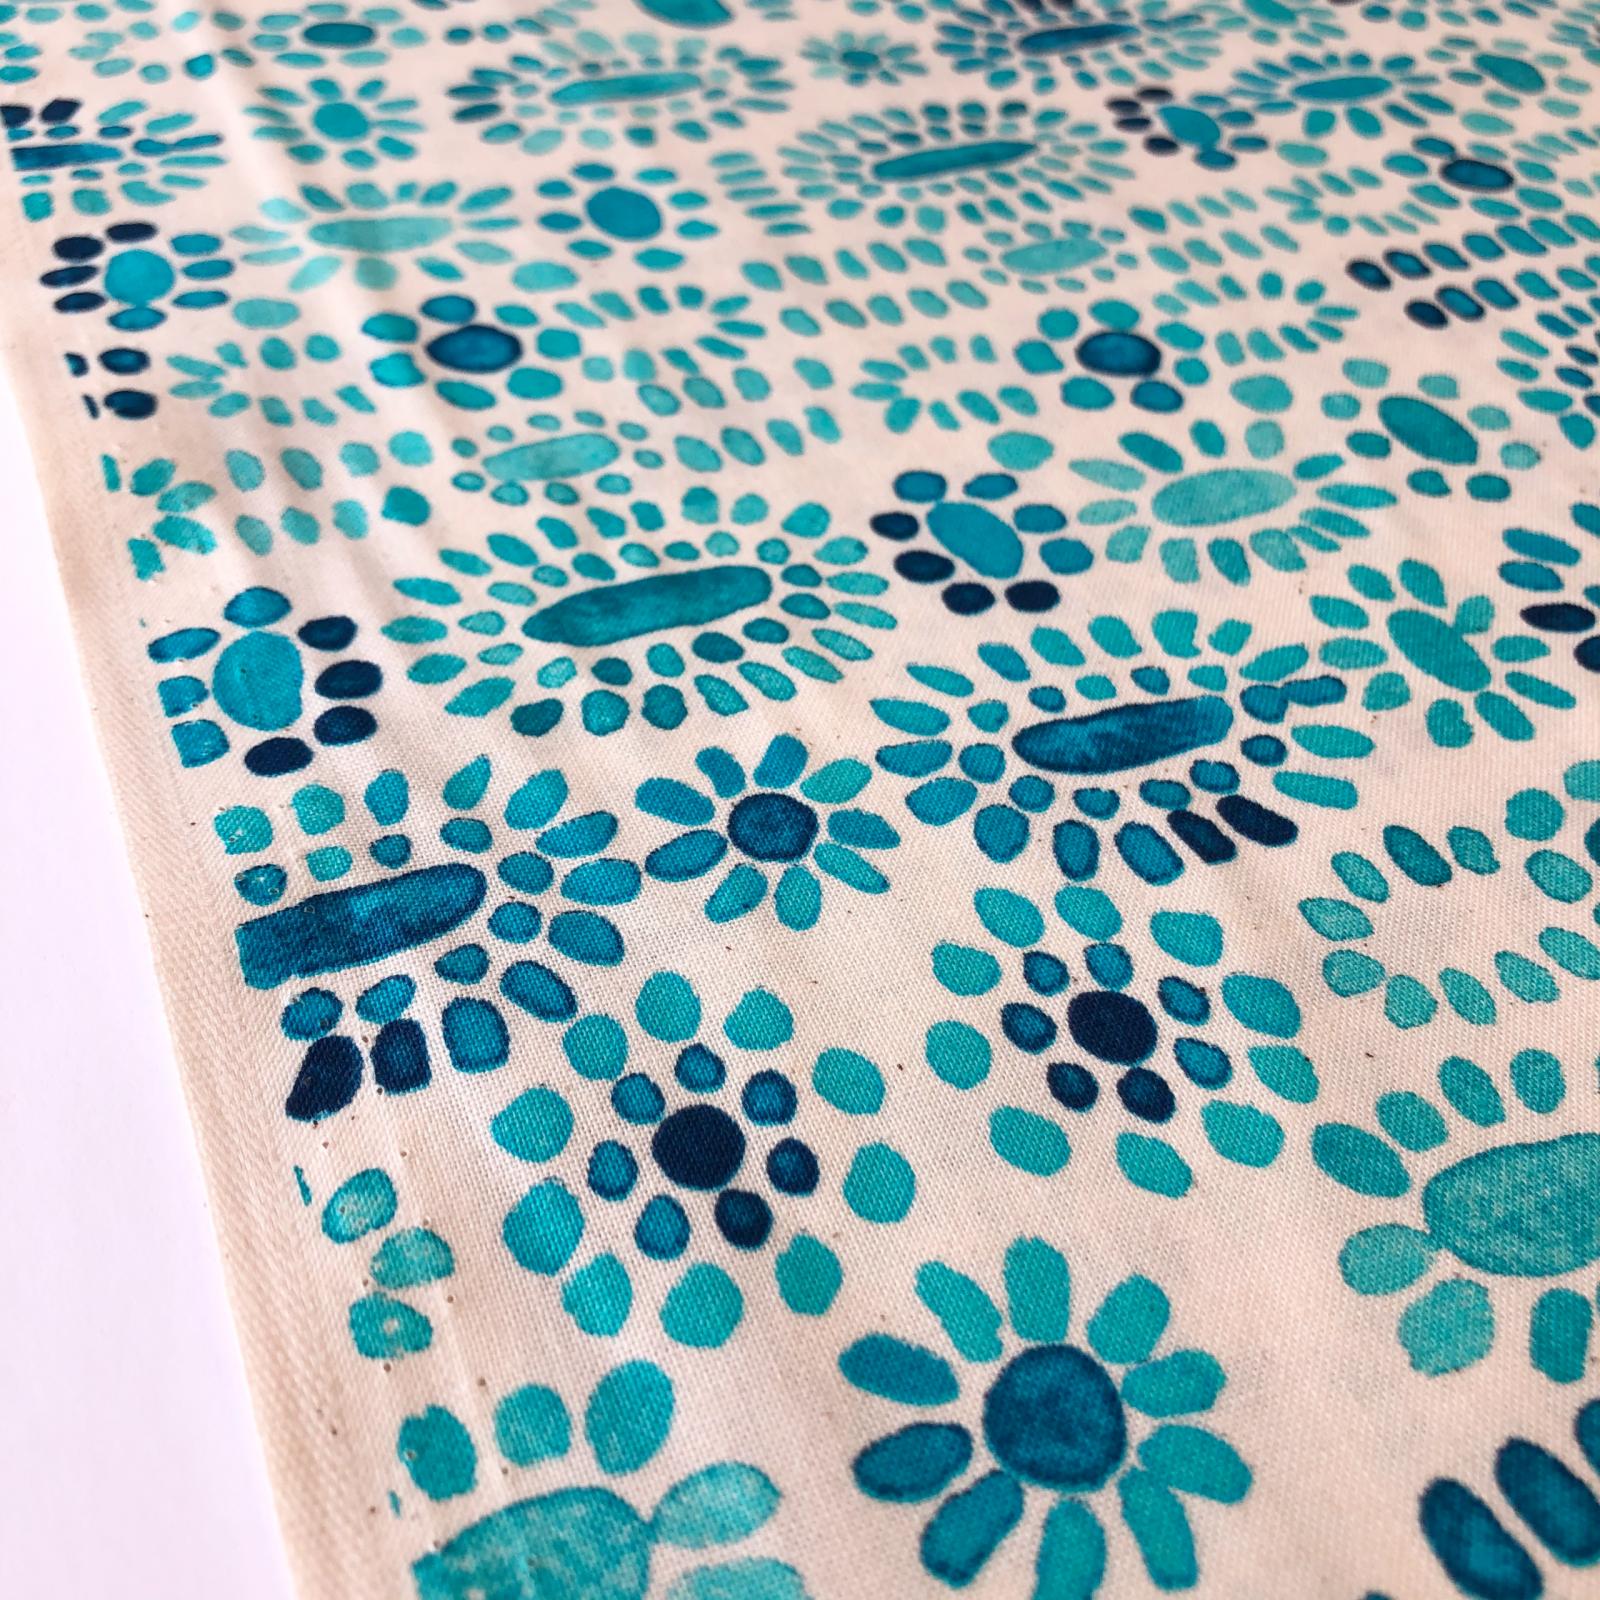 Sienna Cabachon Unbleached Cotton - Turquoise